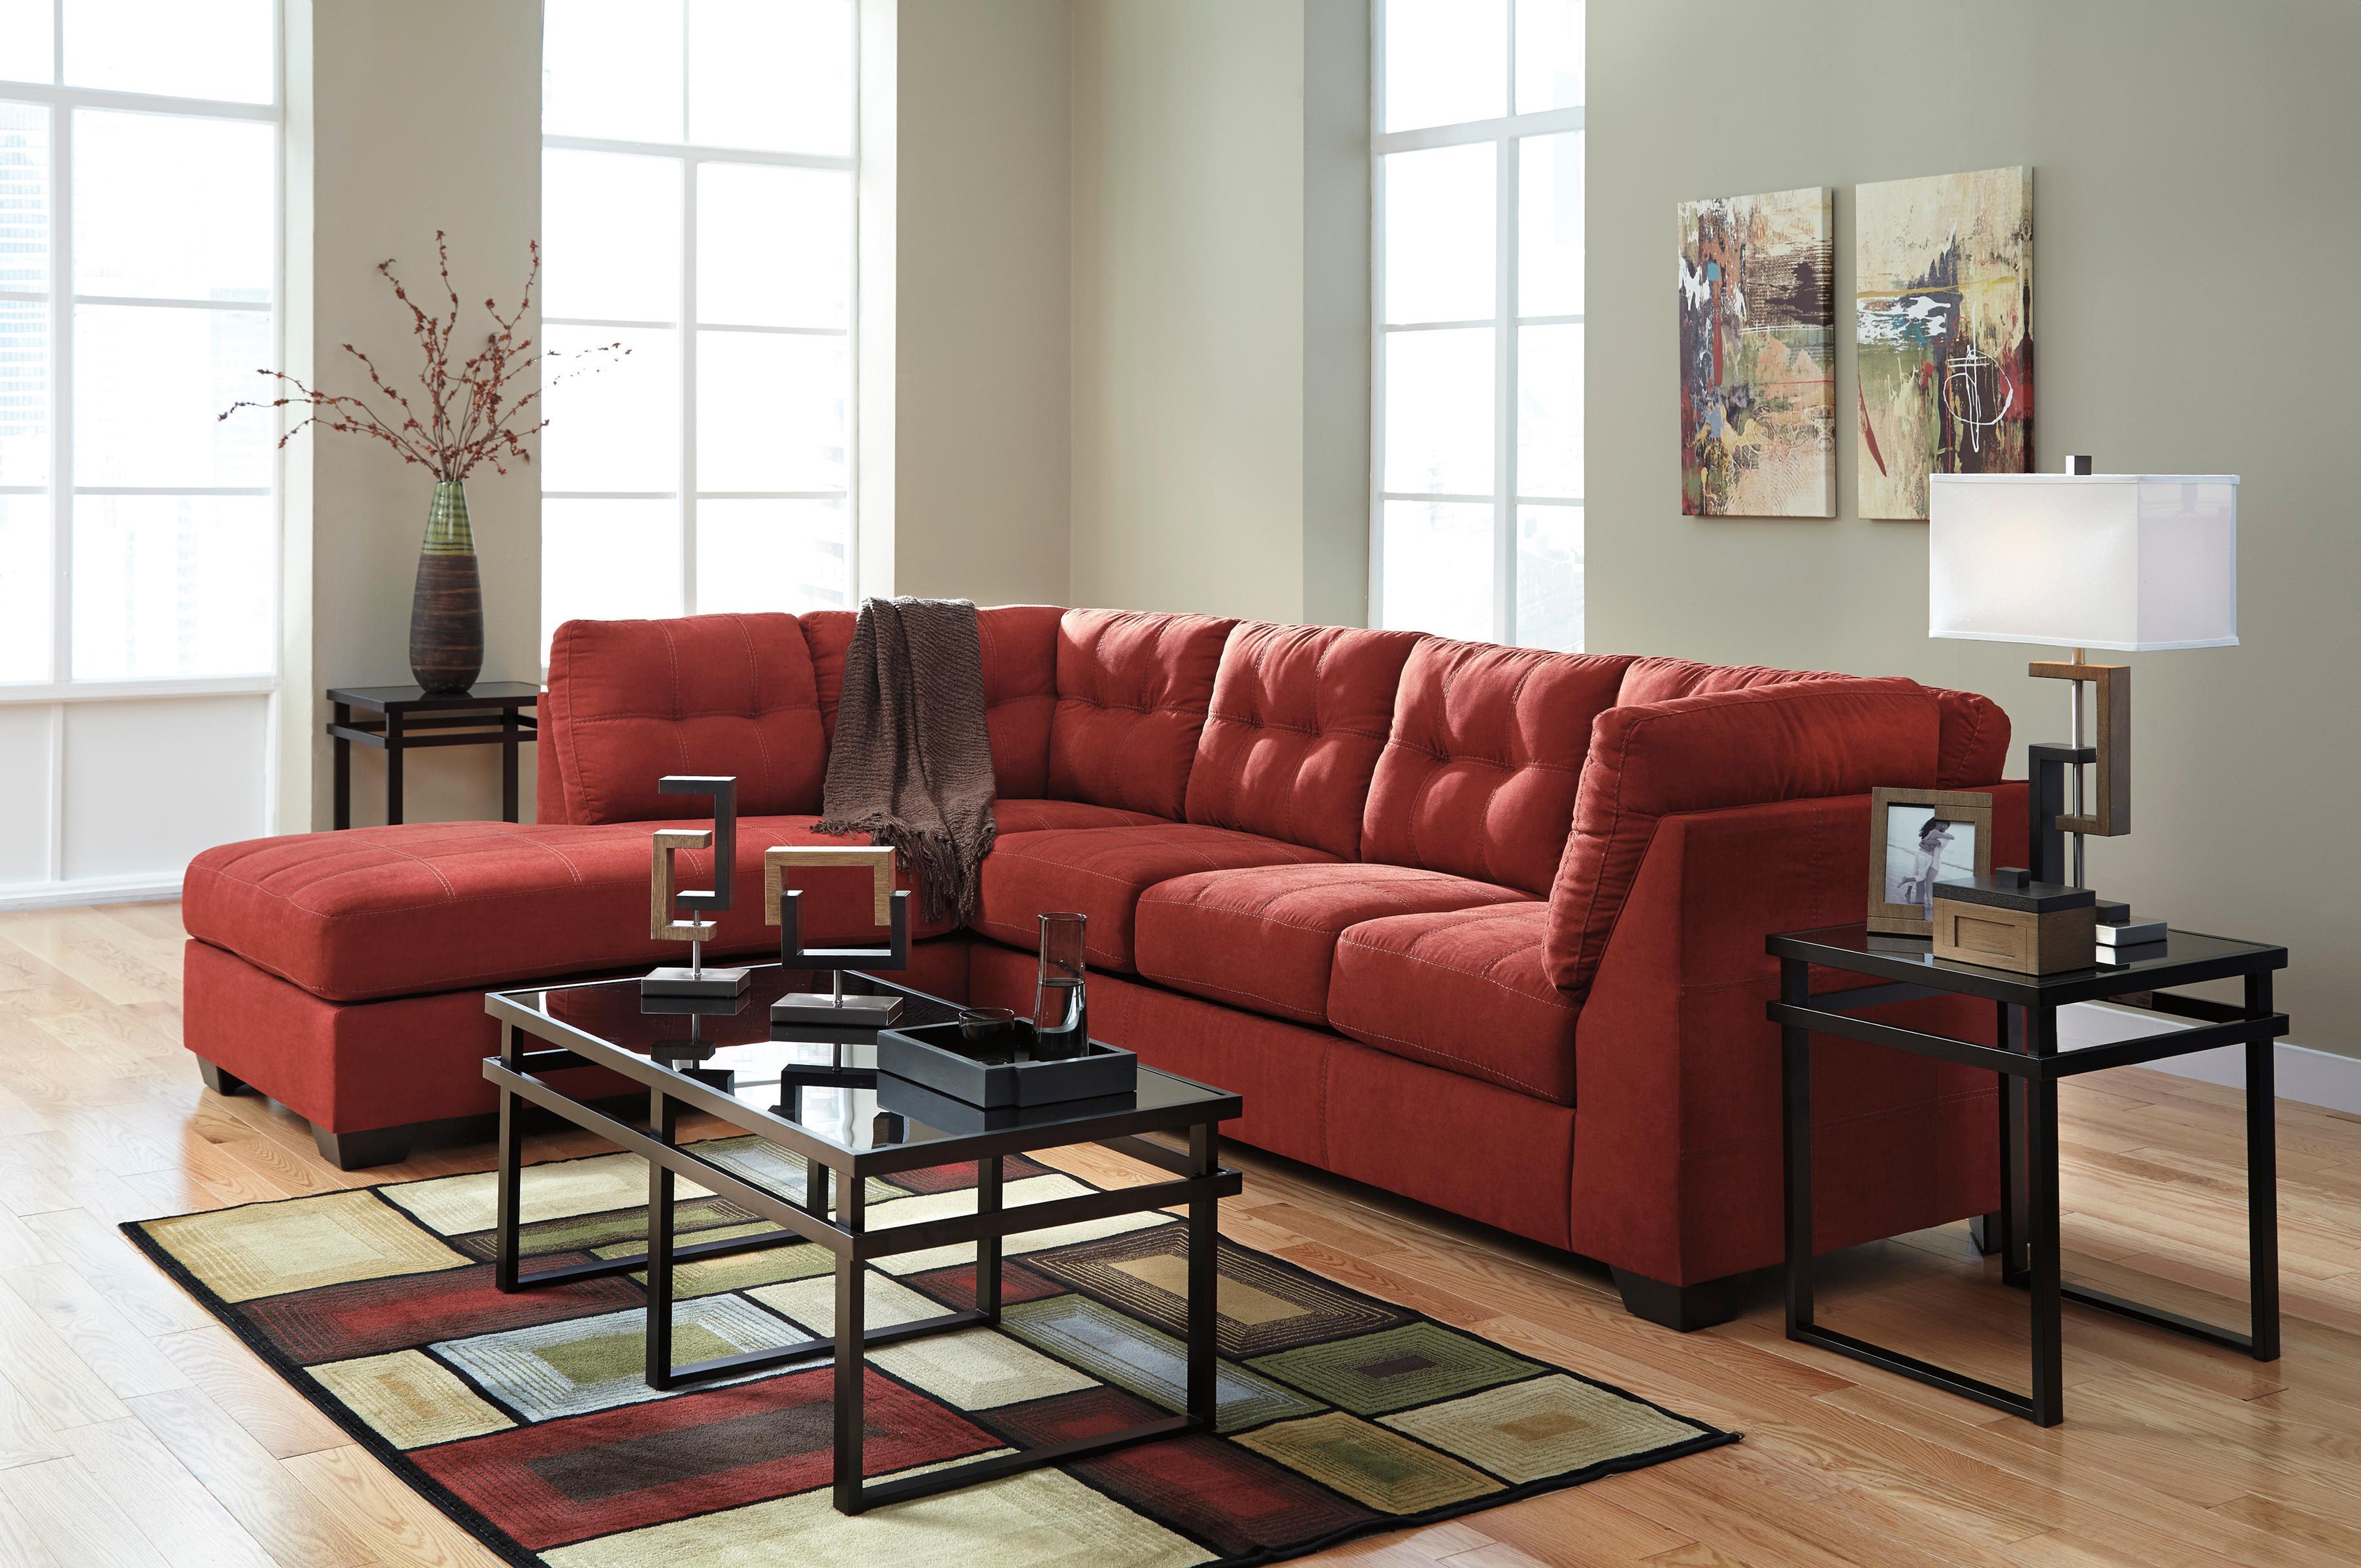 sienna sofa sleeper west elm bliss reviews benchcraft maier 2 piece sectional w